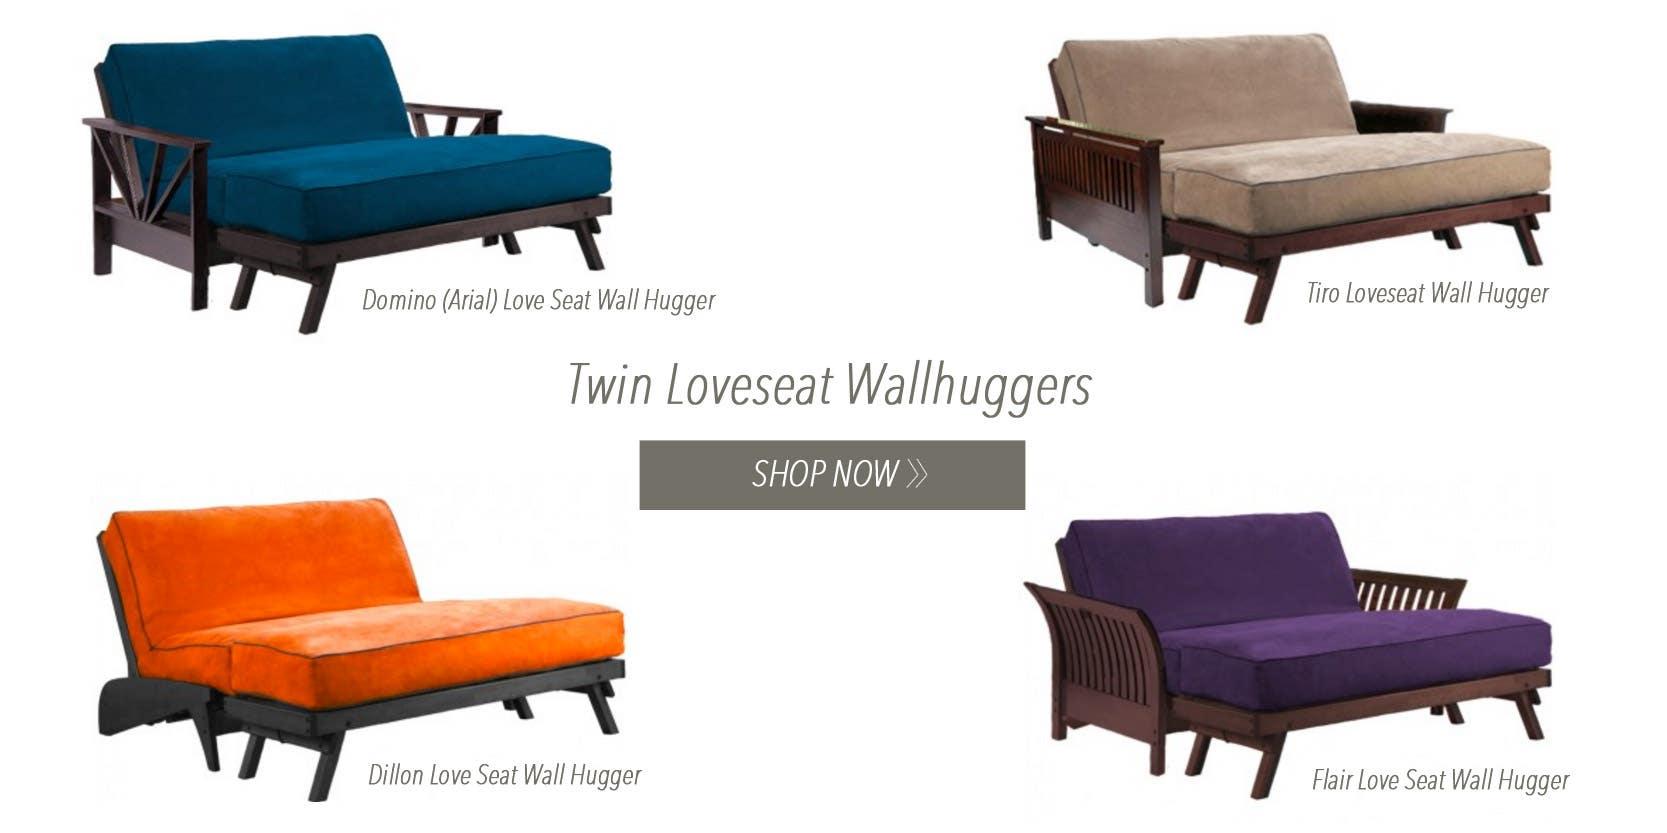 Loveseat Walhugger